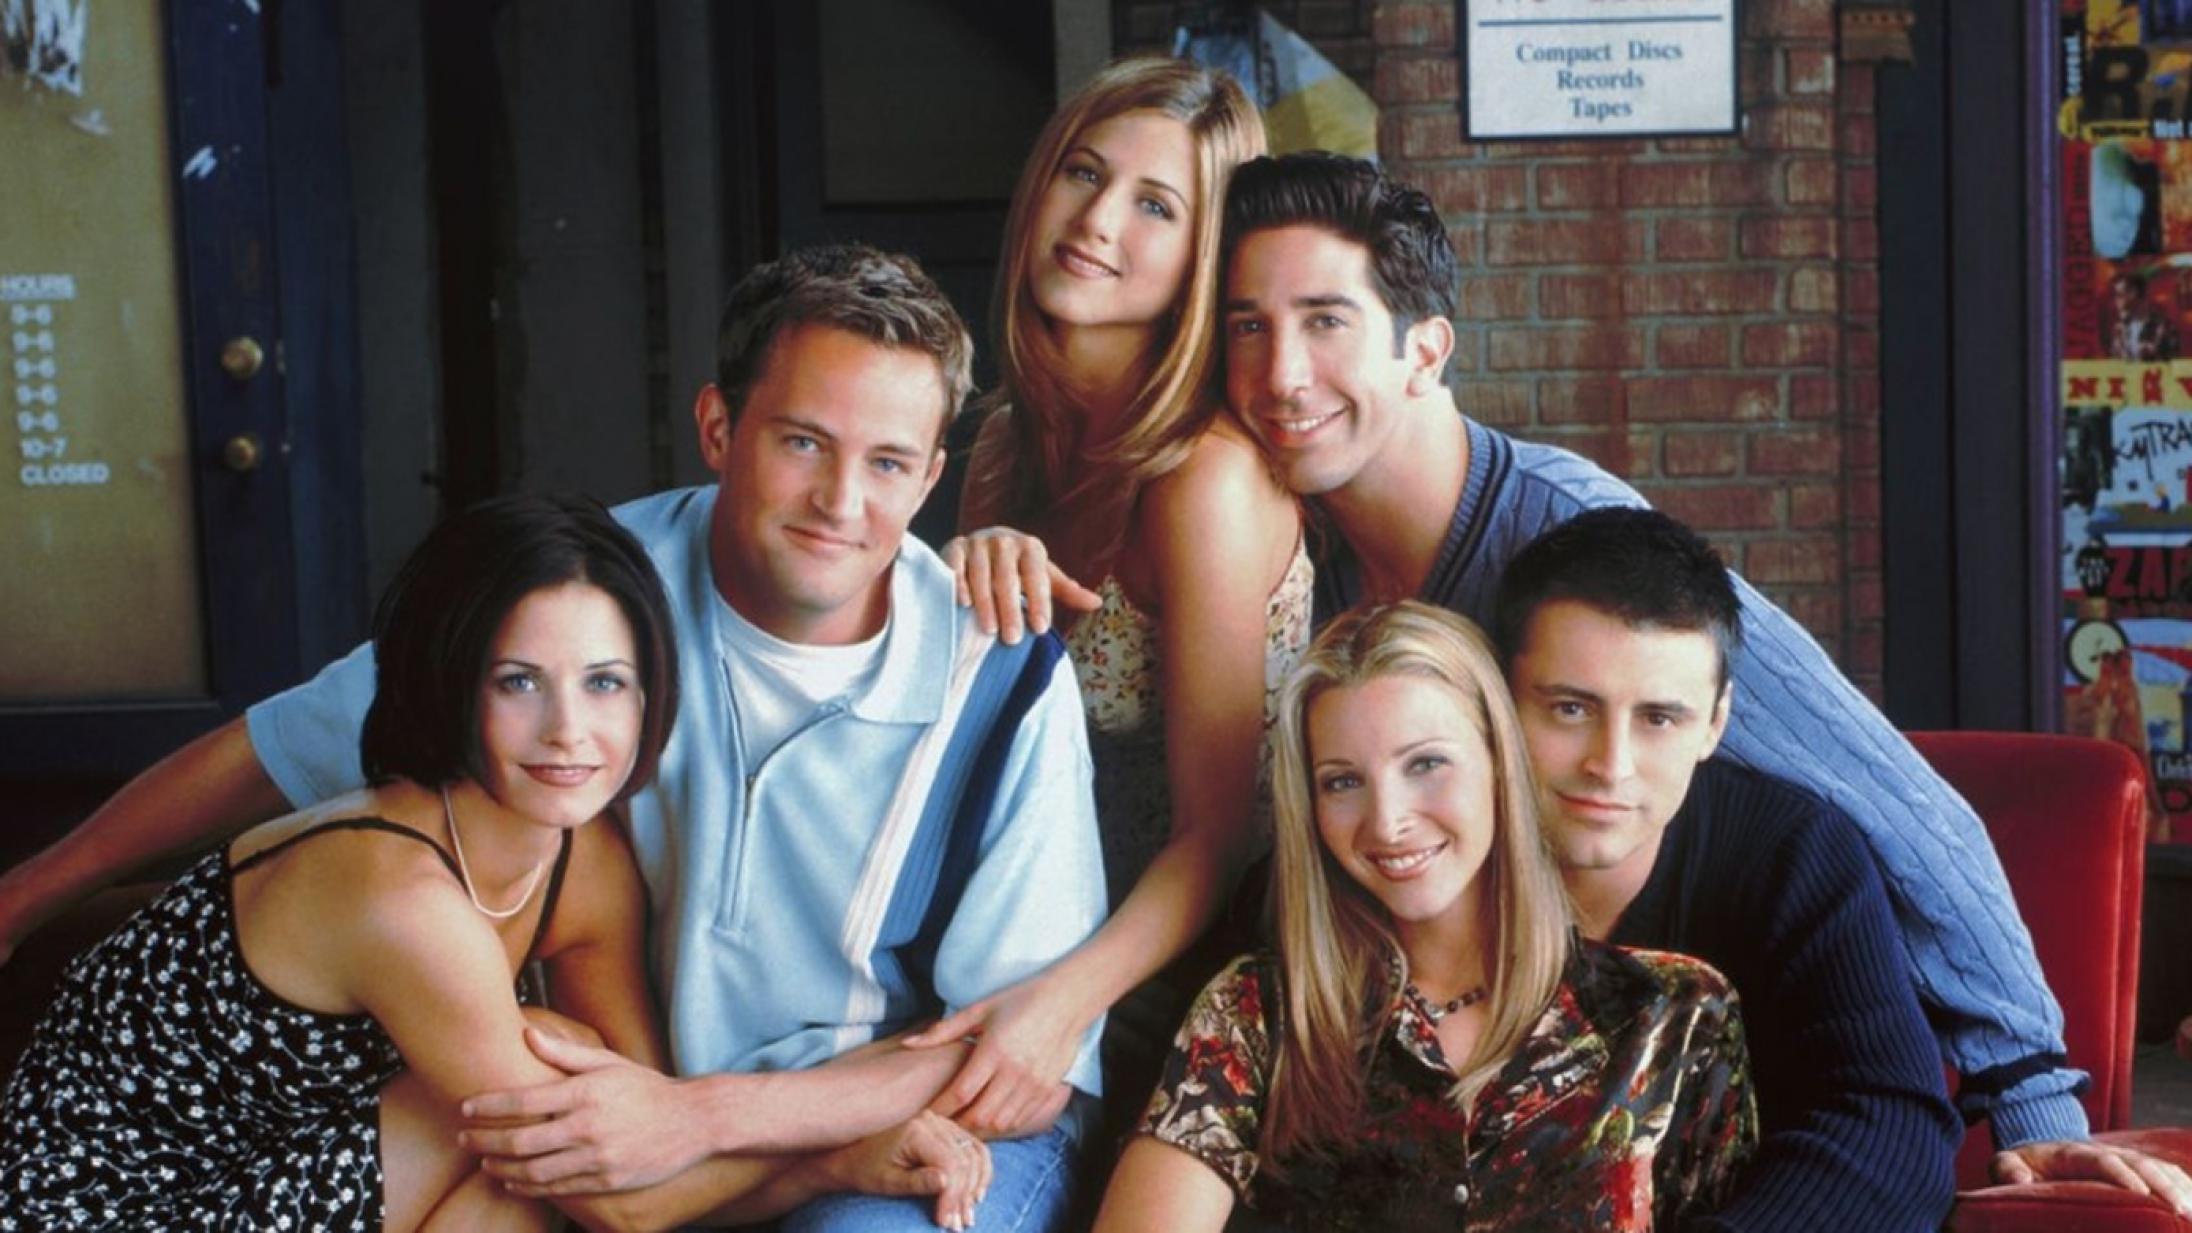 Historisk 'Friends'-reunion udsat på ubestemt tid